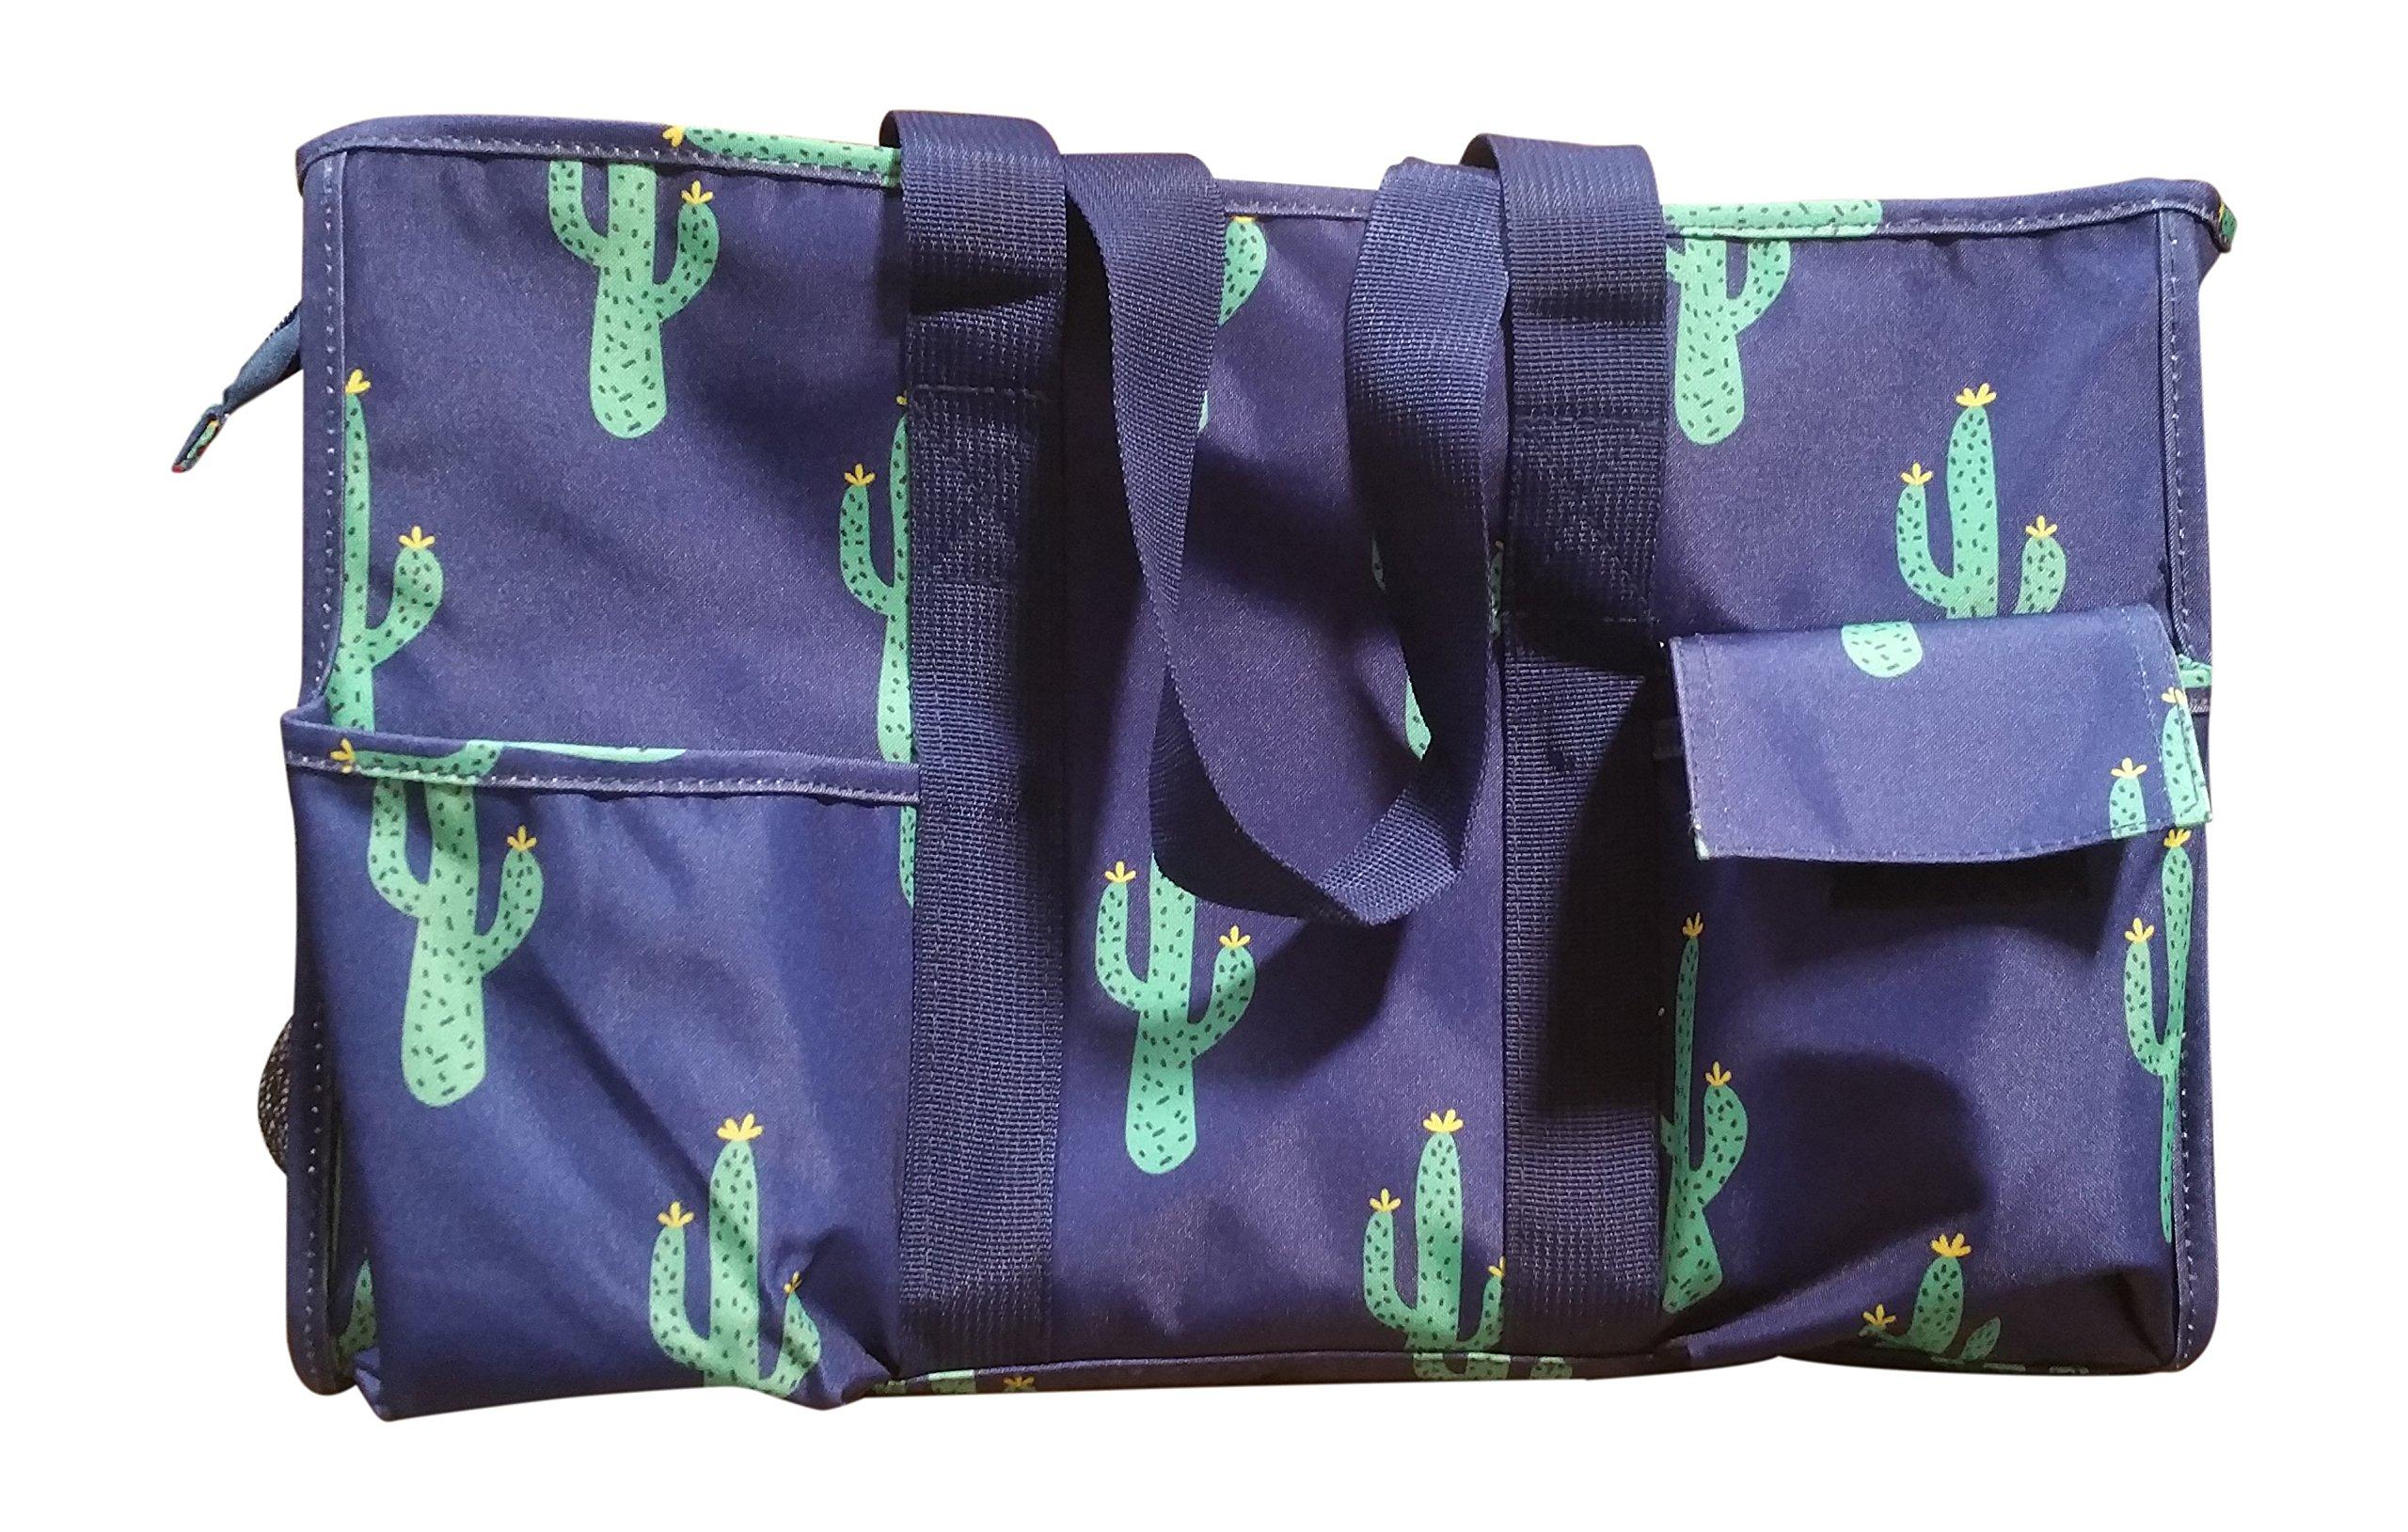 Carryall 7 Pocket Tote Bag With Zipper Closure (Cactus)